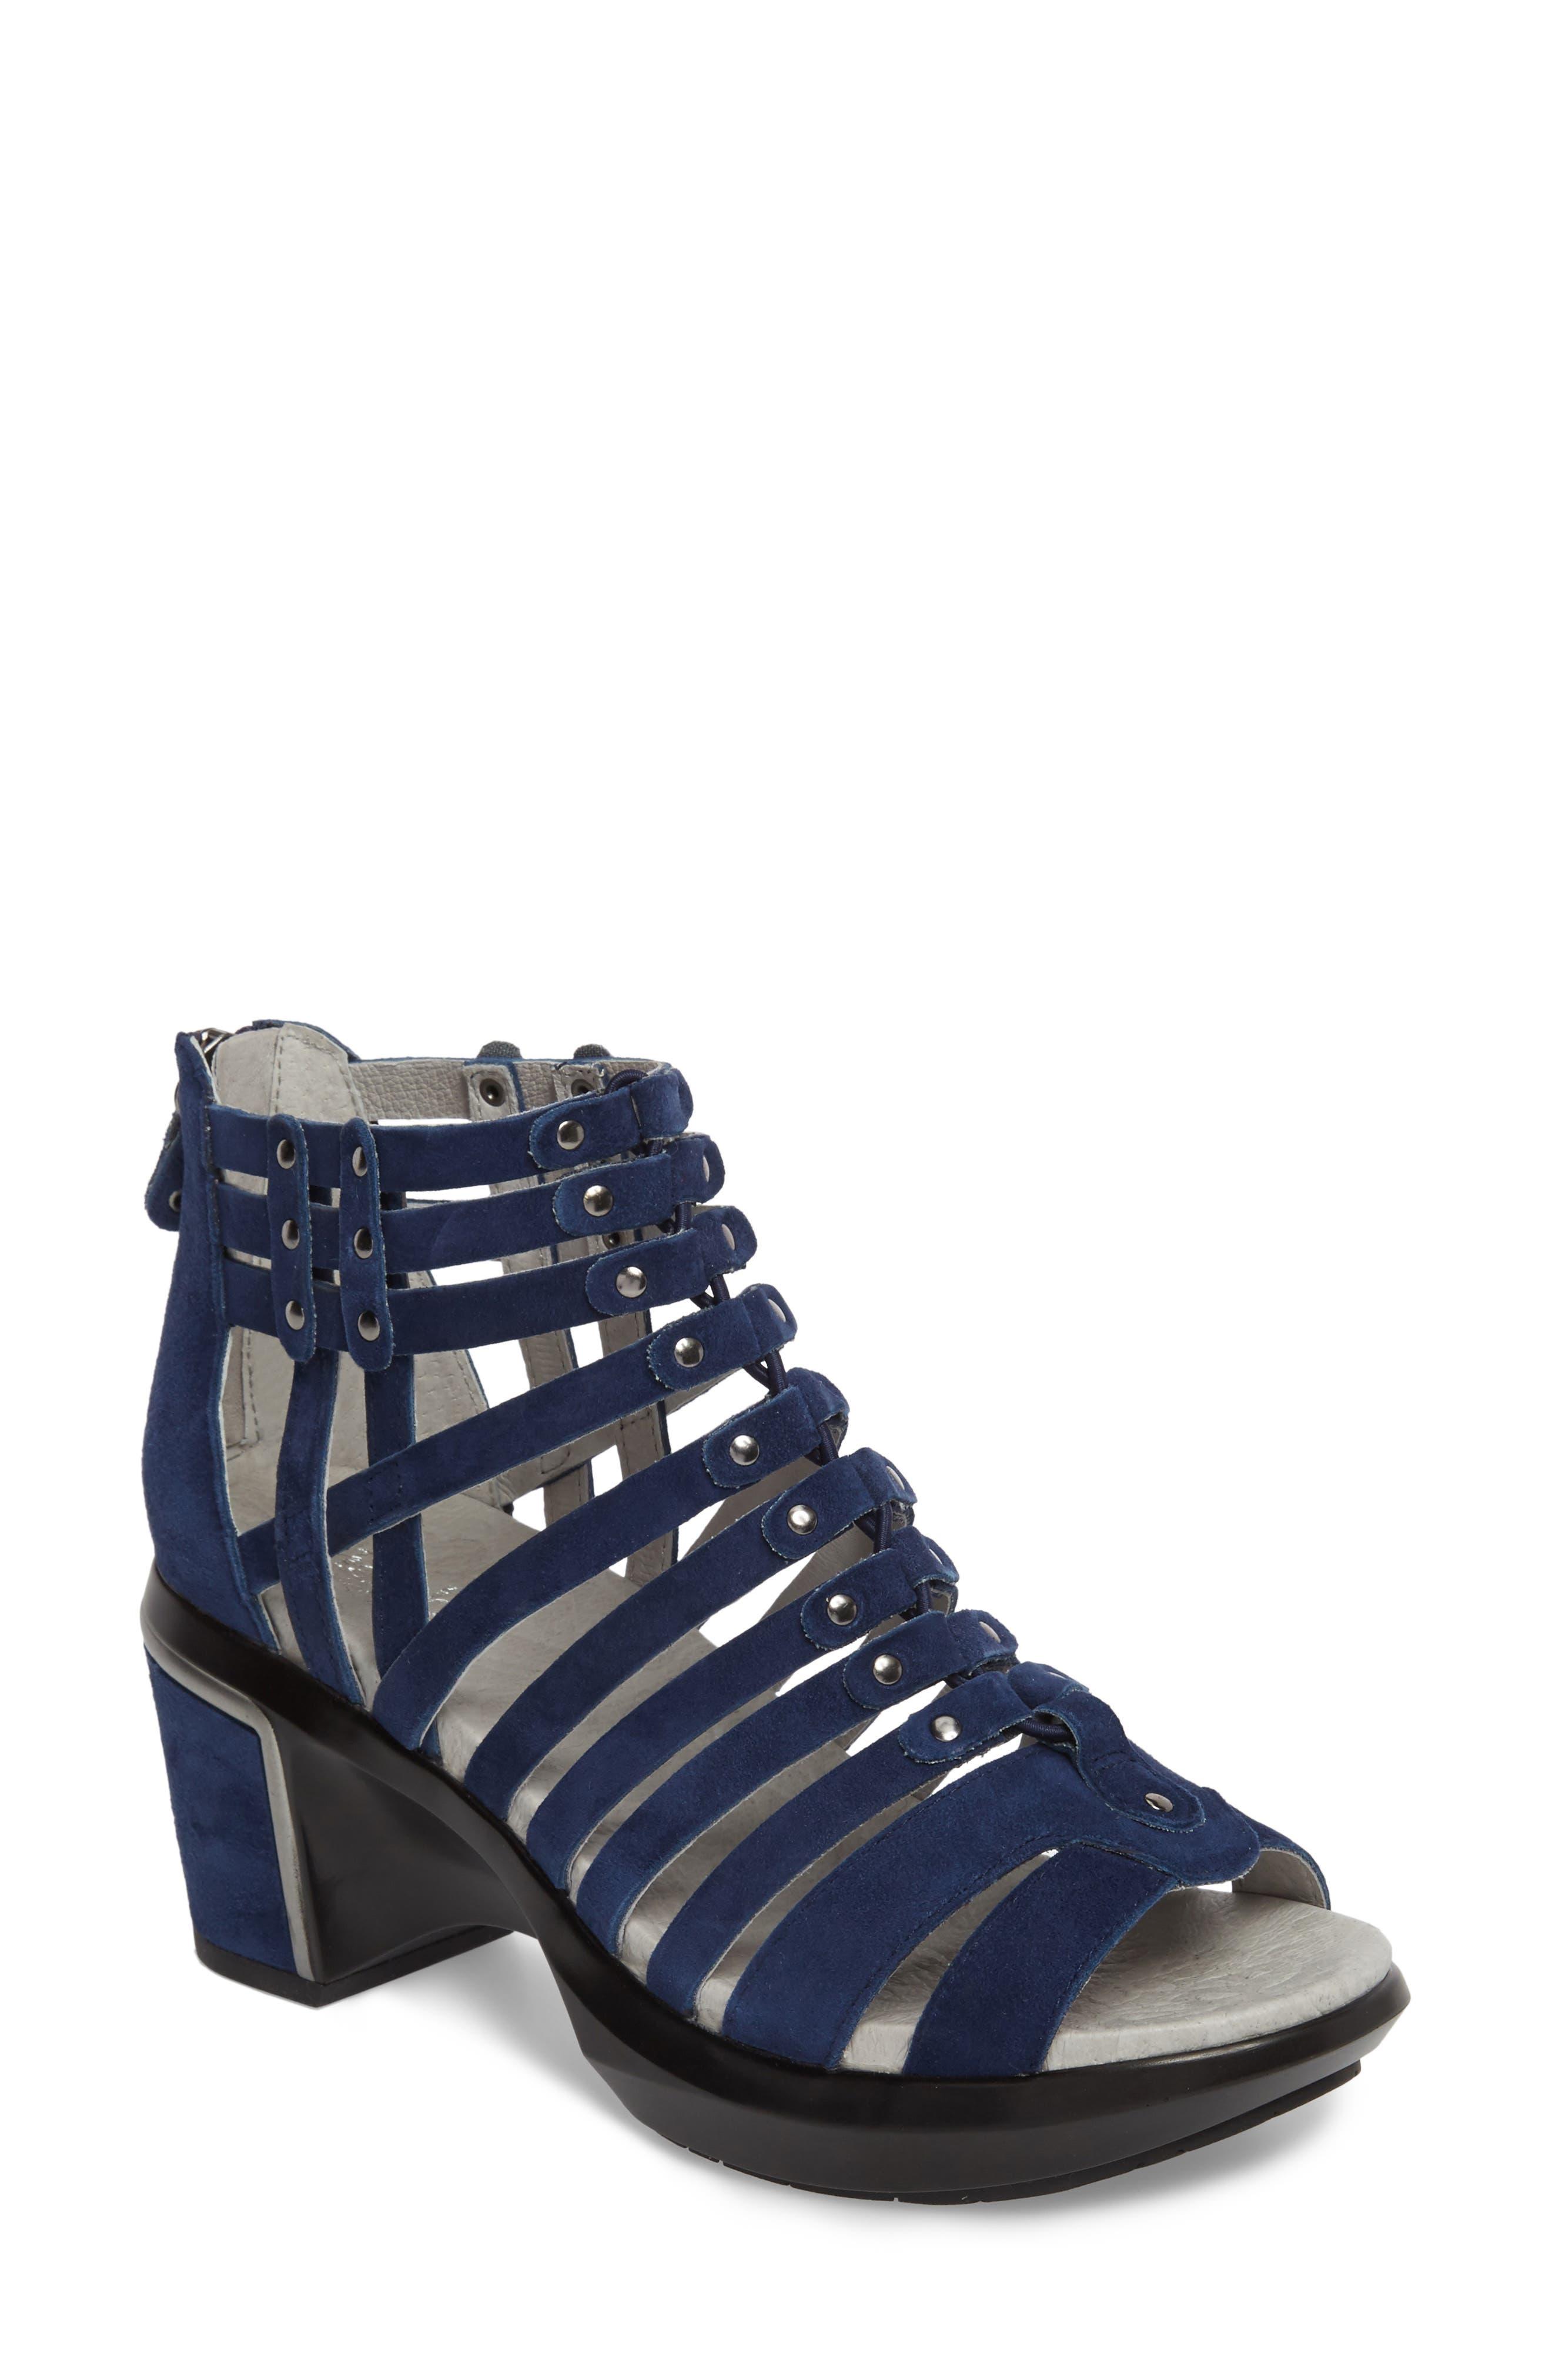 Sugar Too Gladiator Sandal,                         Main,                         color, Navy Suede